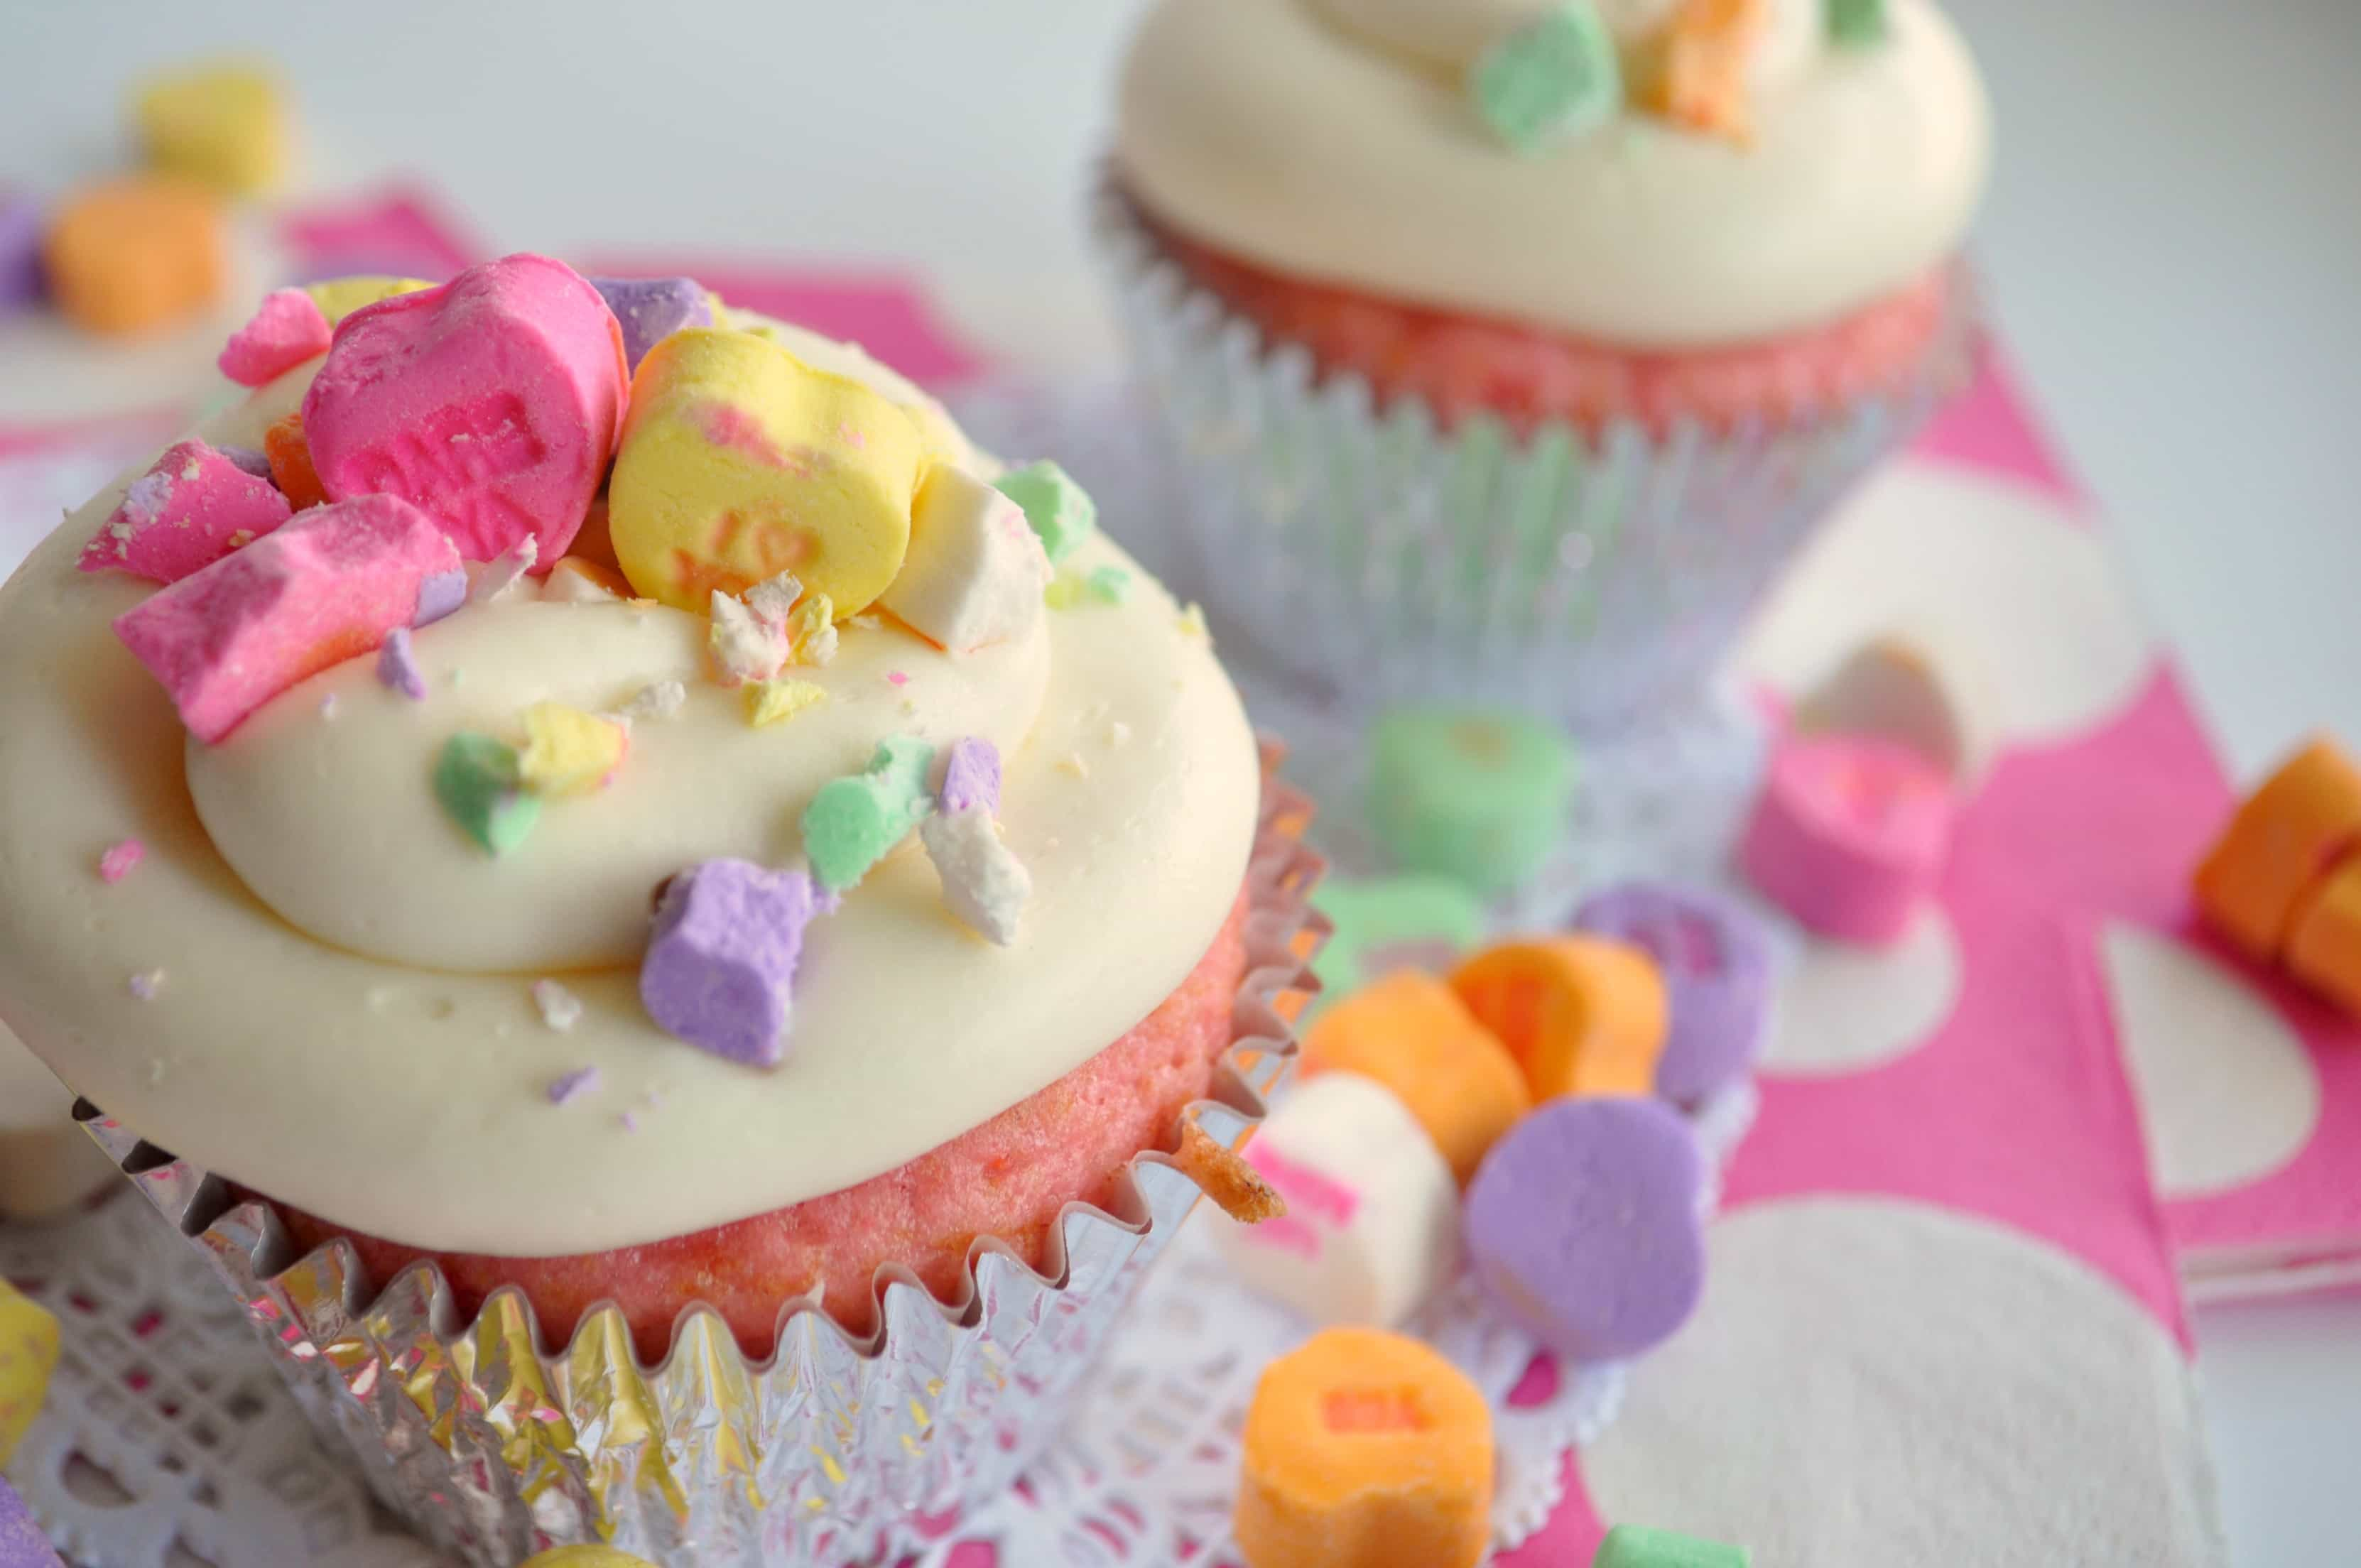 Valentine's Day Cupcake Decorating Ideas {House of Yumm}